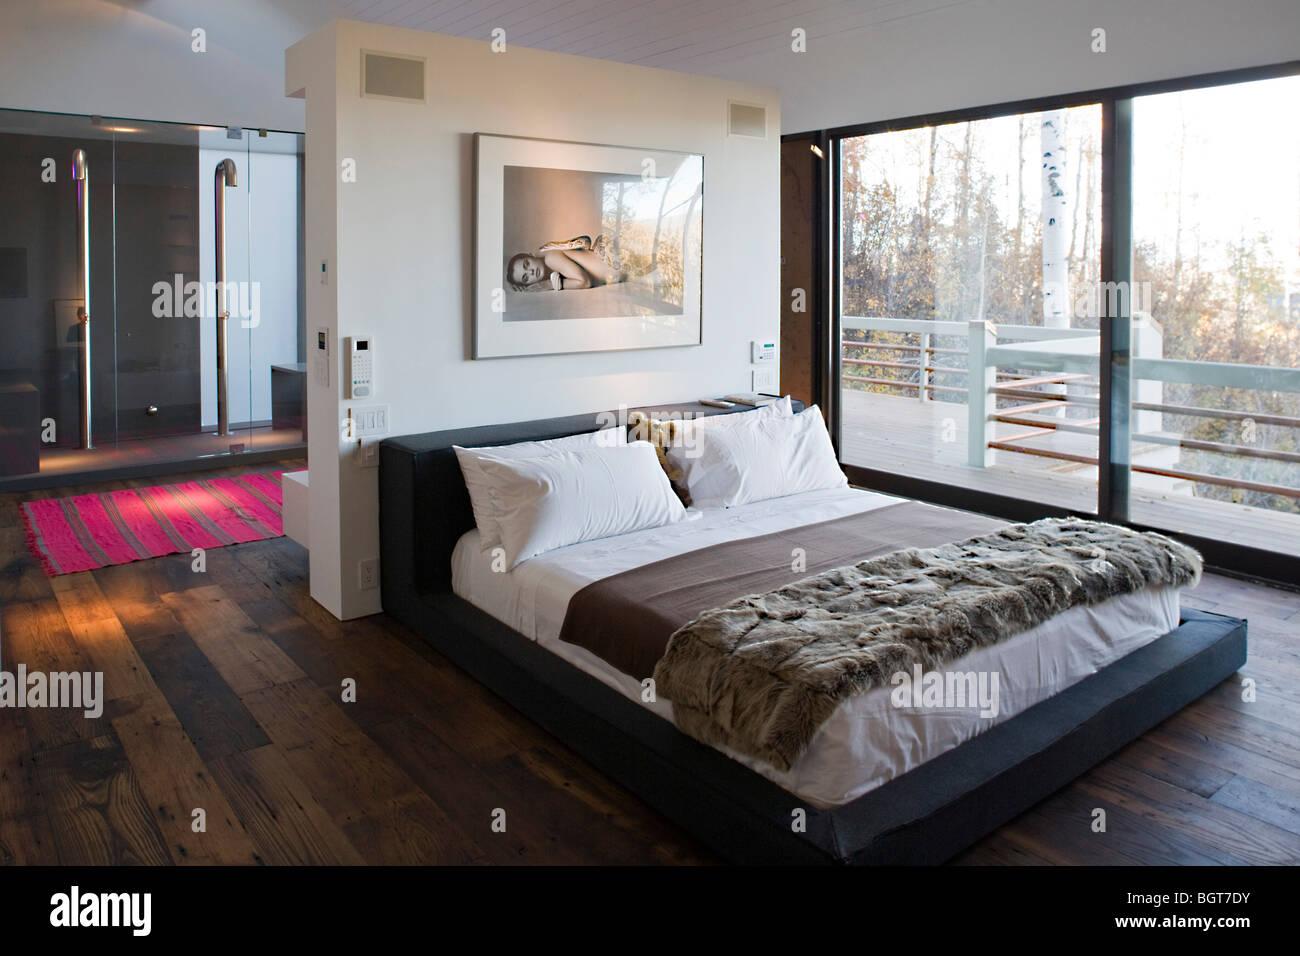 Snowmass Village Aspen Fiona Cowan Wohn Interieur Design Schlafzimmer Holz  Holz Schiebetür Terrasse American Contemporary